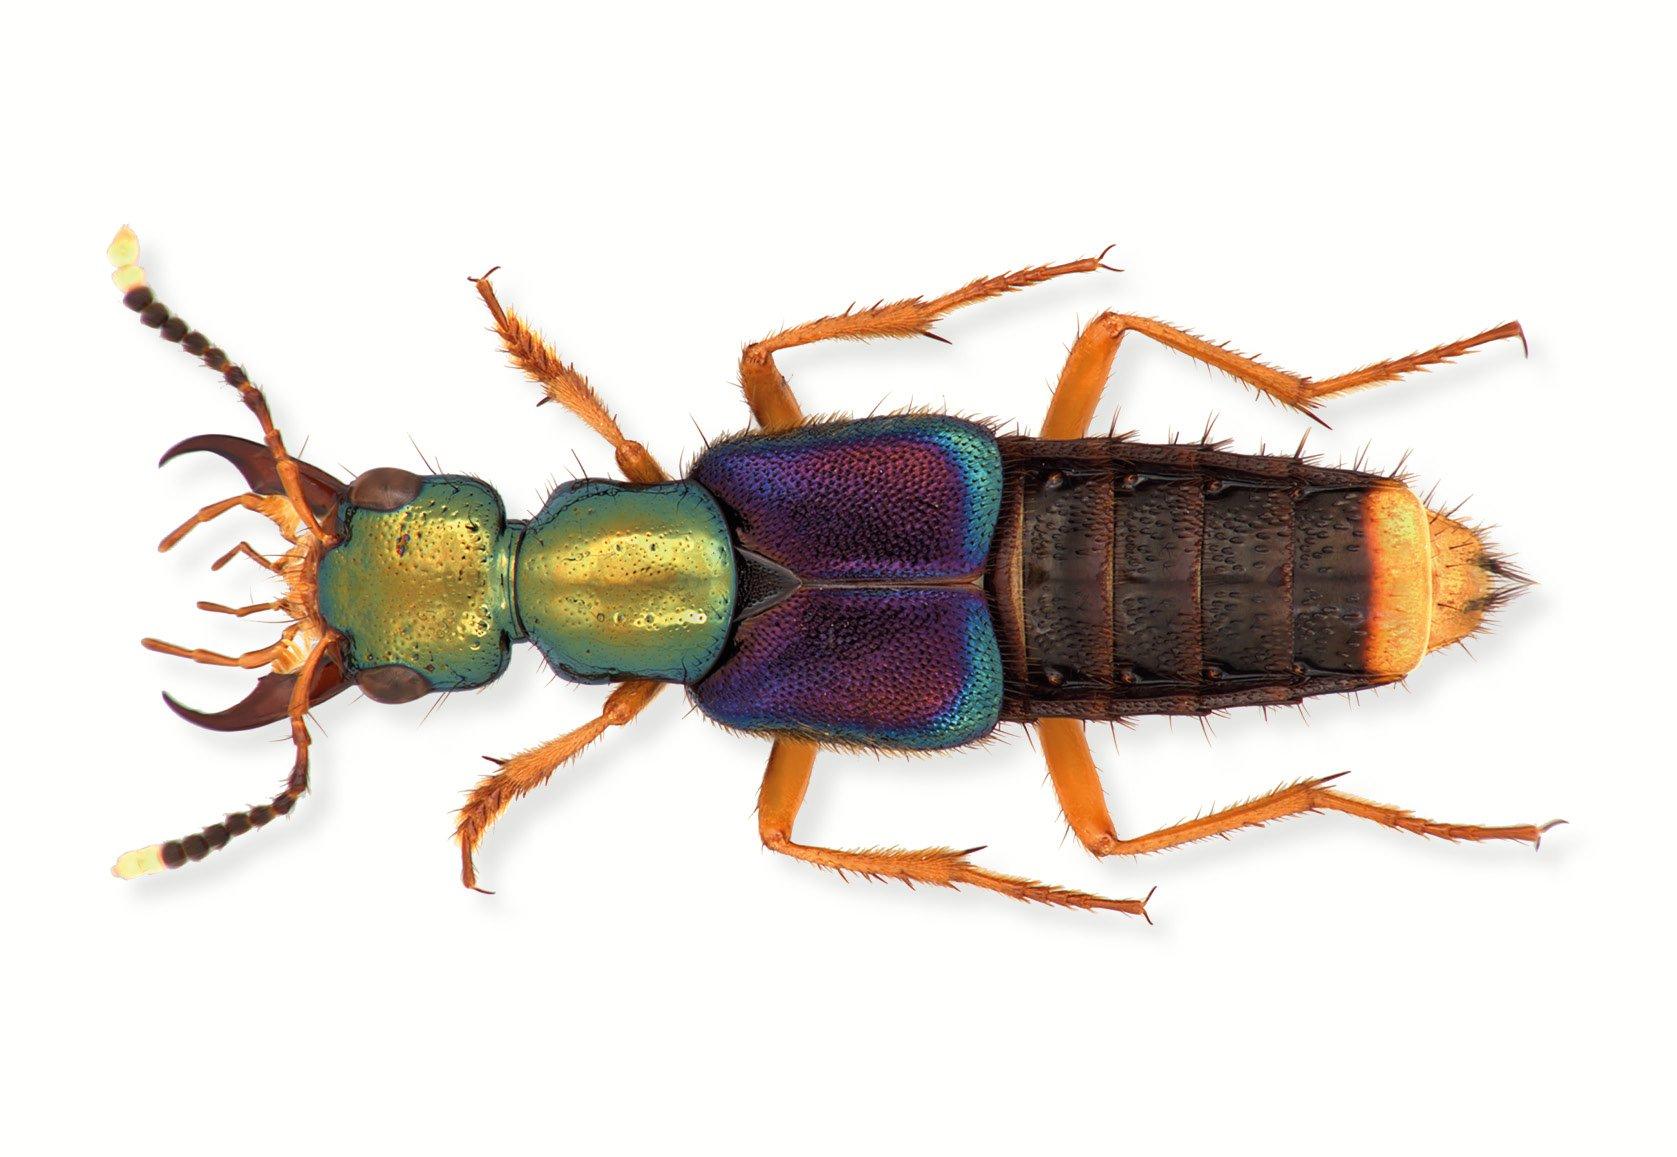 A Box of Beetles: Amazon.de: Patrice Bouchard: Fremdsprachige Bücher